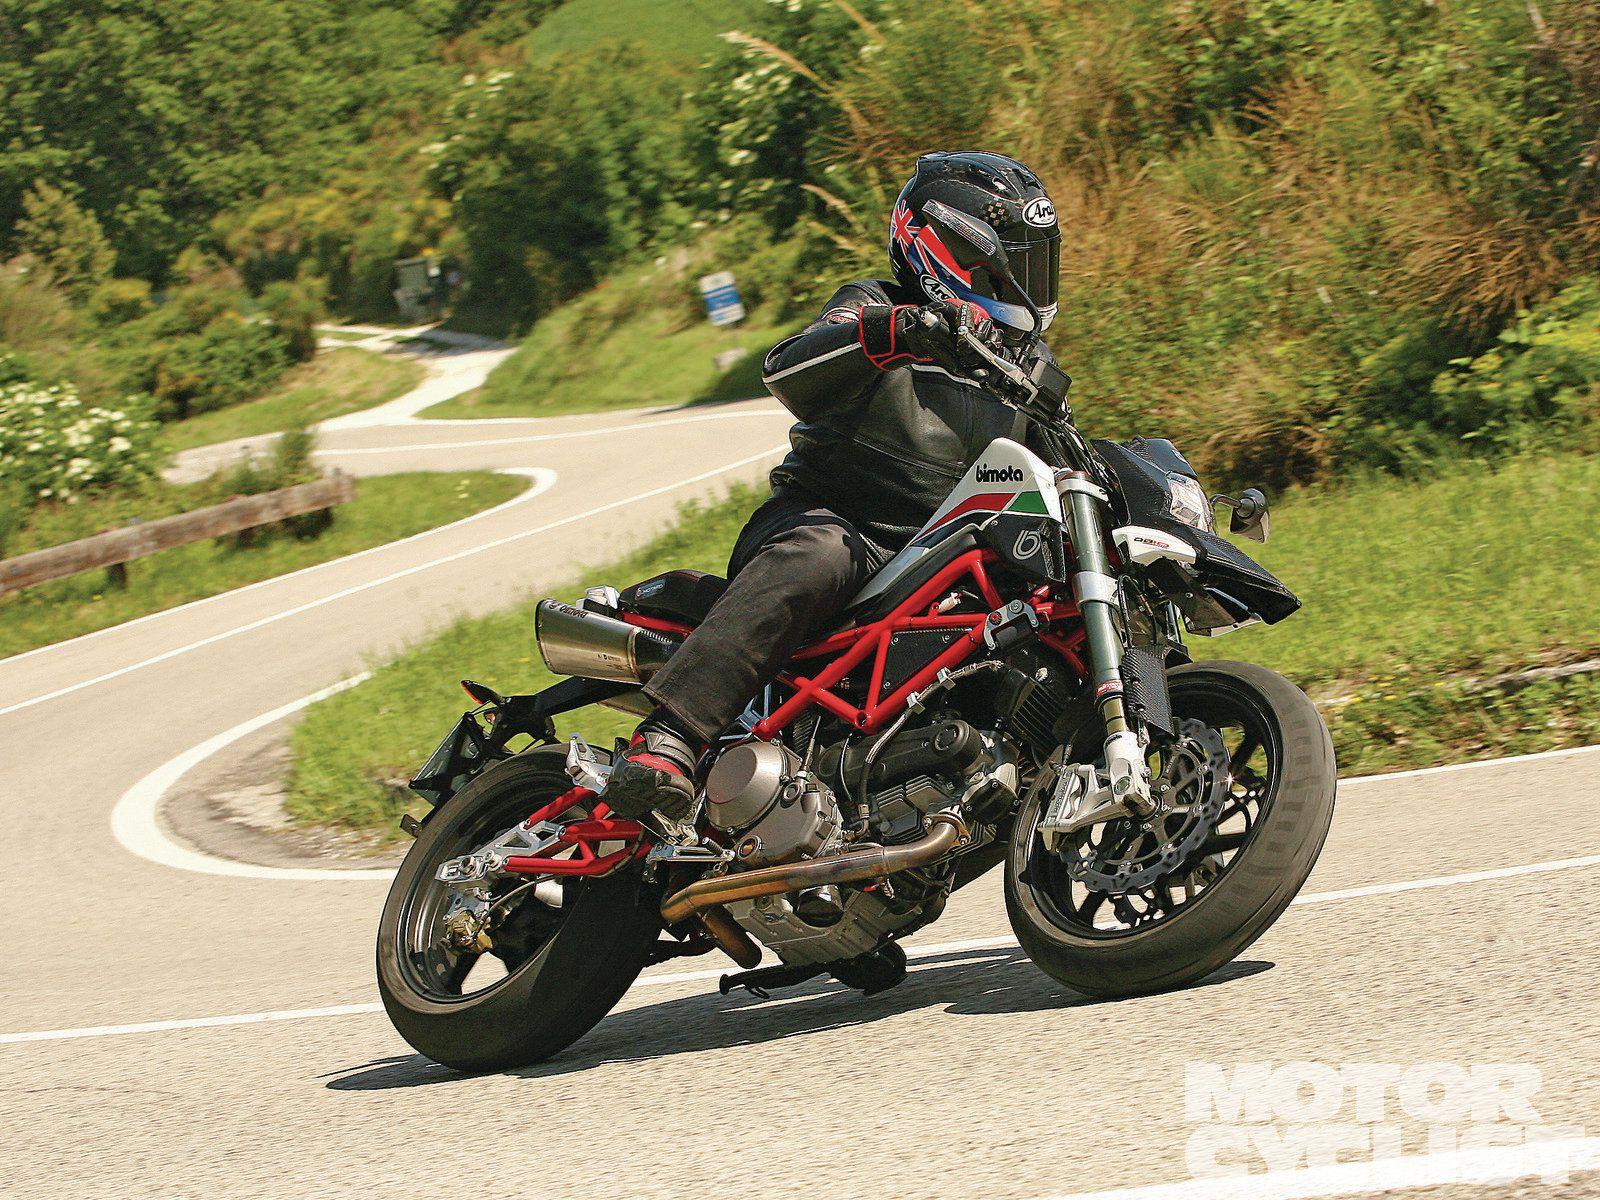 Bimota Db10 Motard Motorcyclist